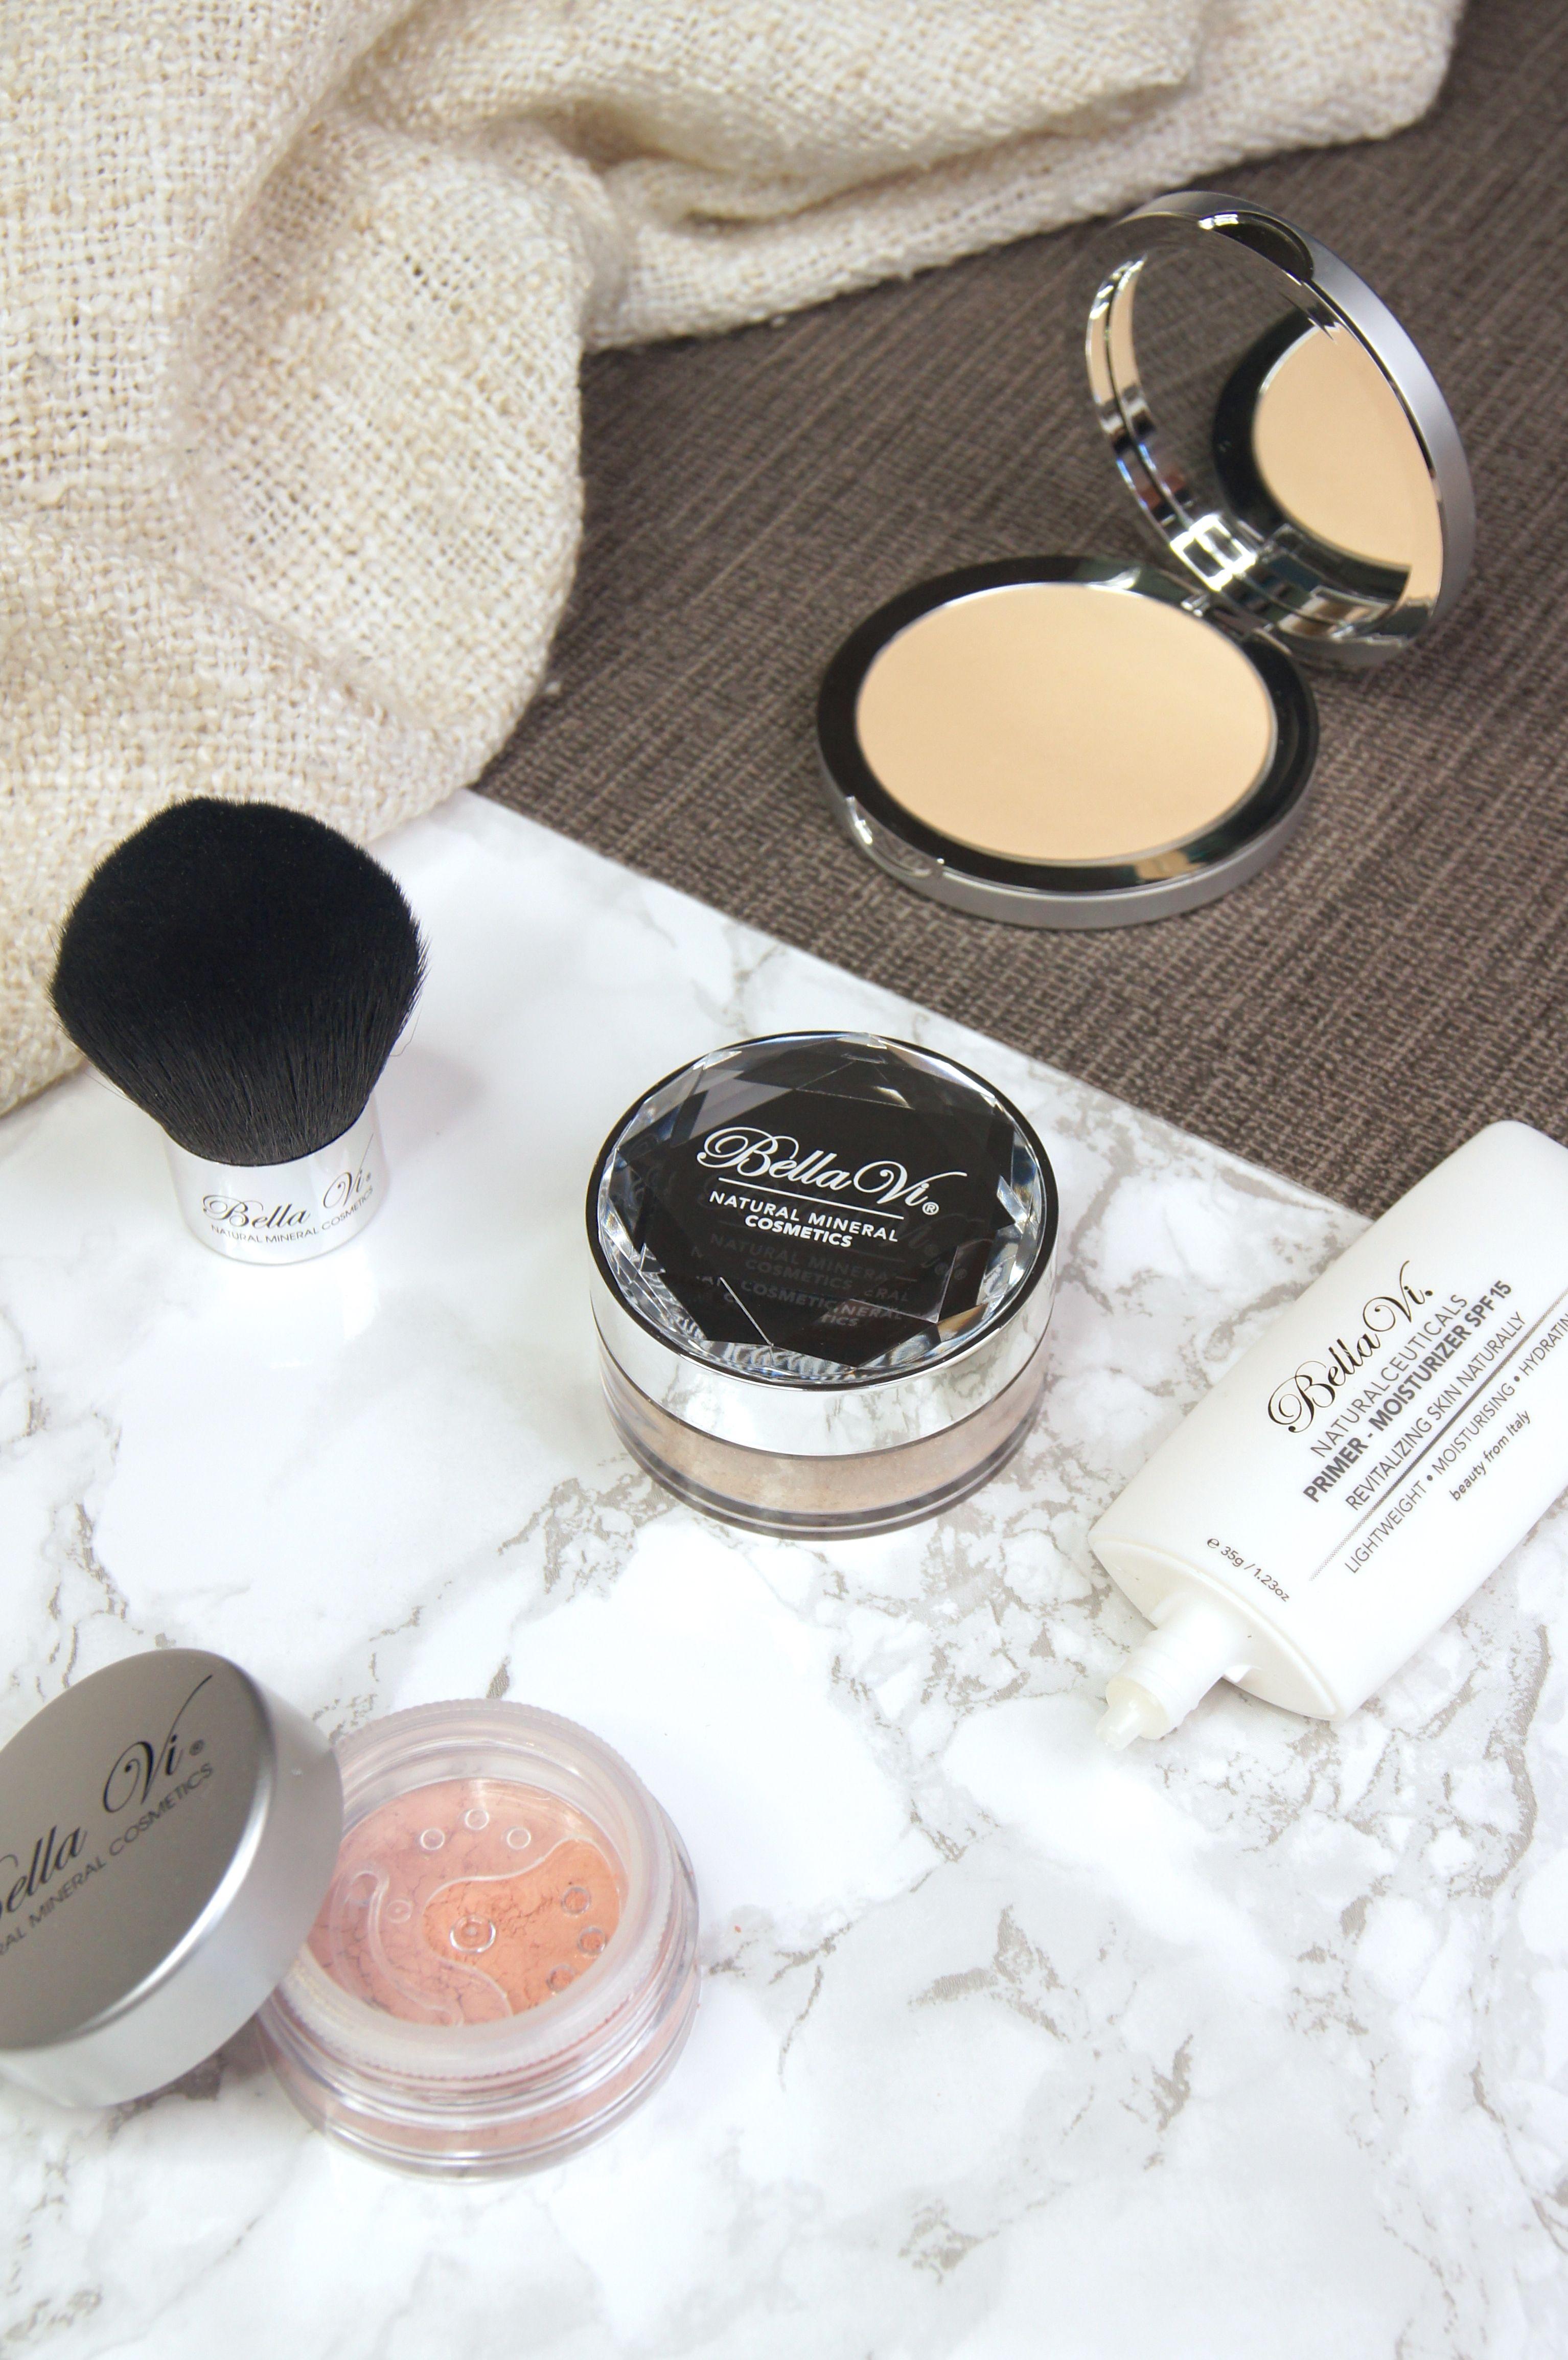 CrueltyFree, Natural, Mineral Makeup Review Bella Vi